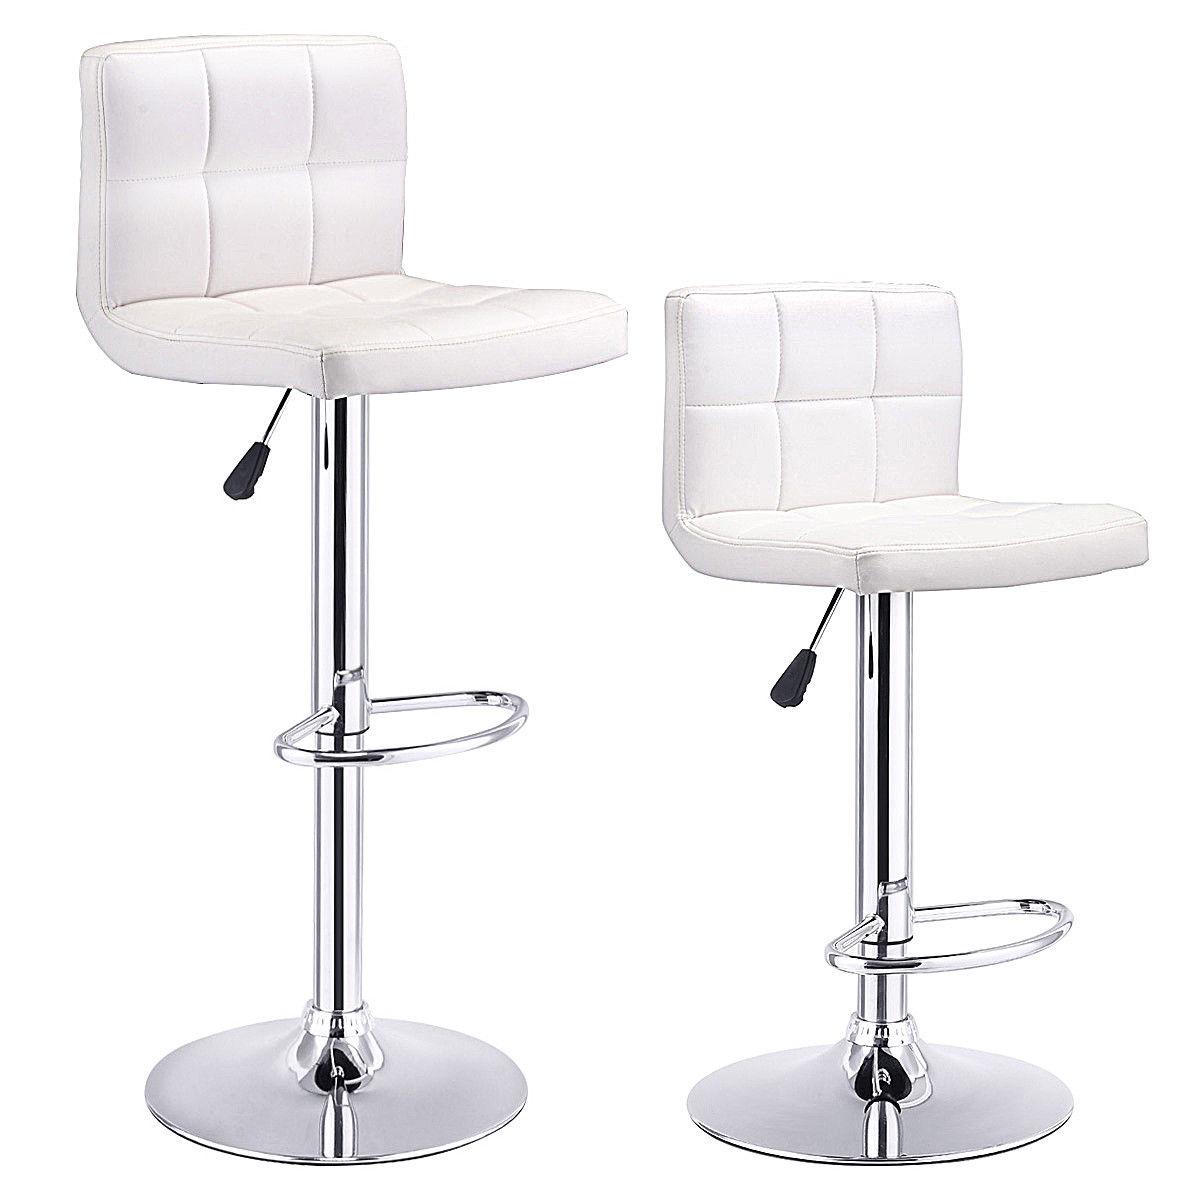 Costway Set Of 2 Bar Stools PU Leather Adjustable Barstool Swivel Pub Chairs White